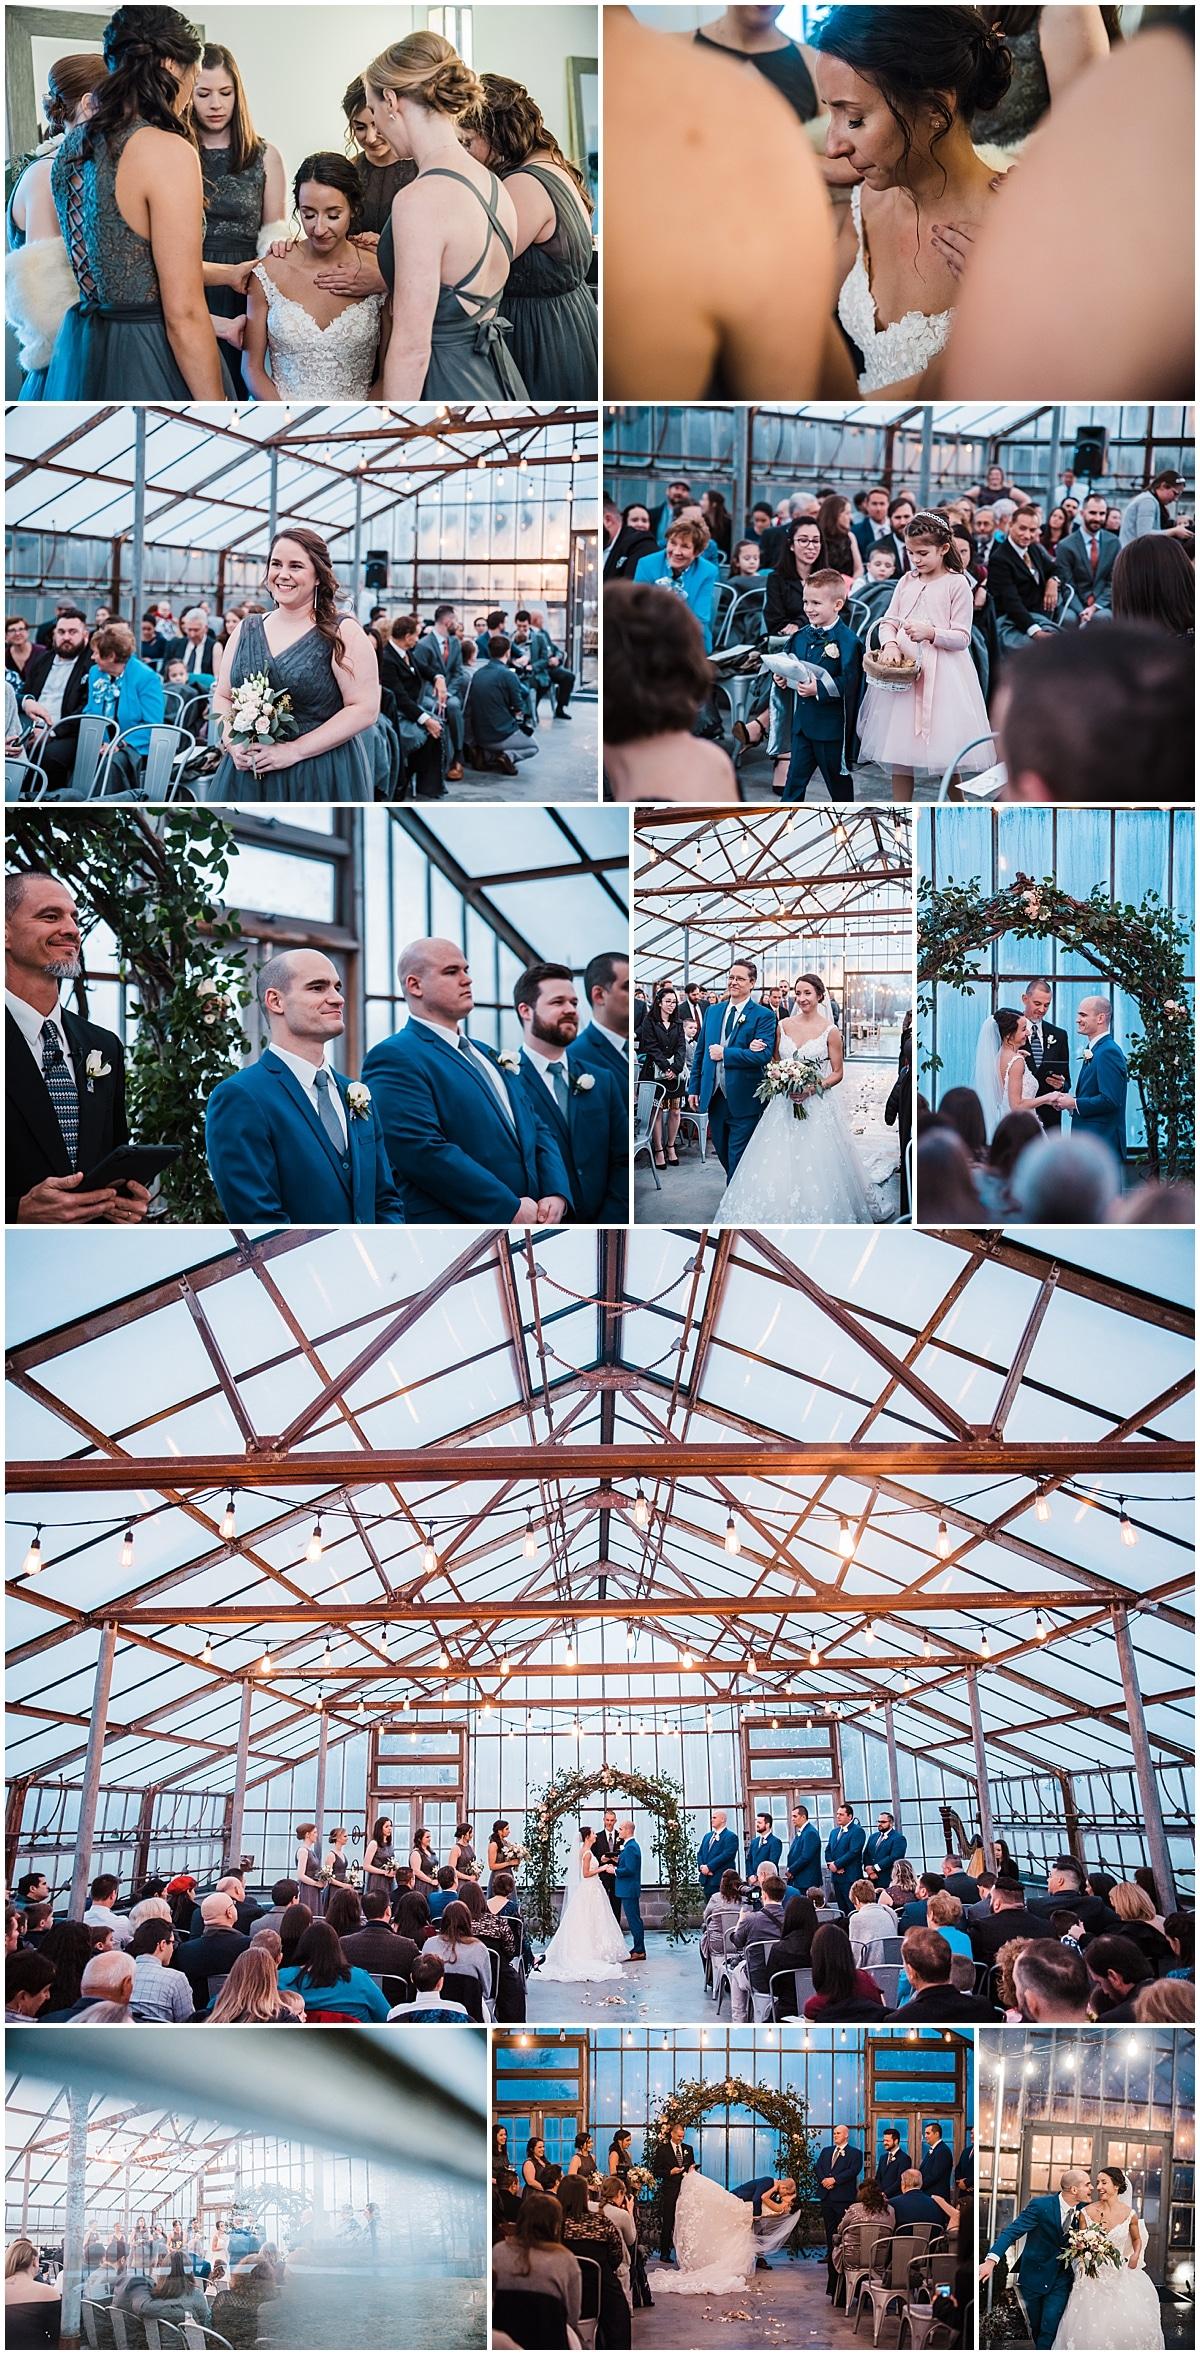 Jorgensen Farms Oak Grove wedding ceremony